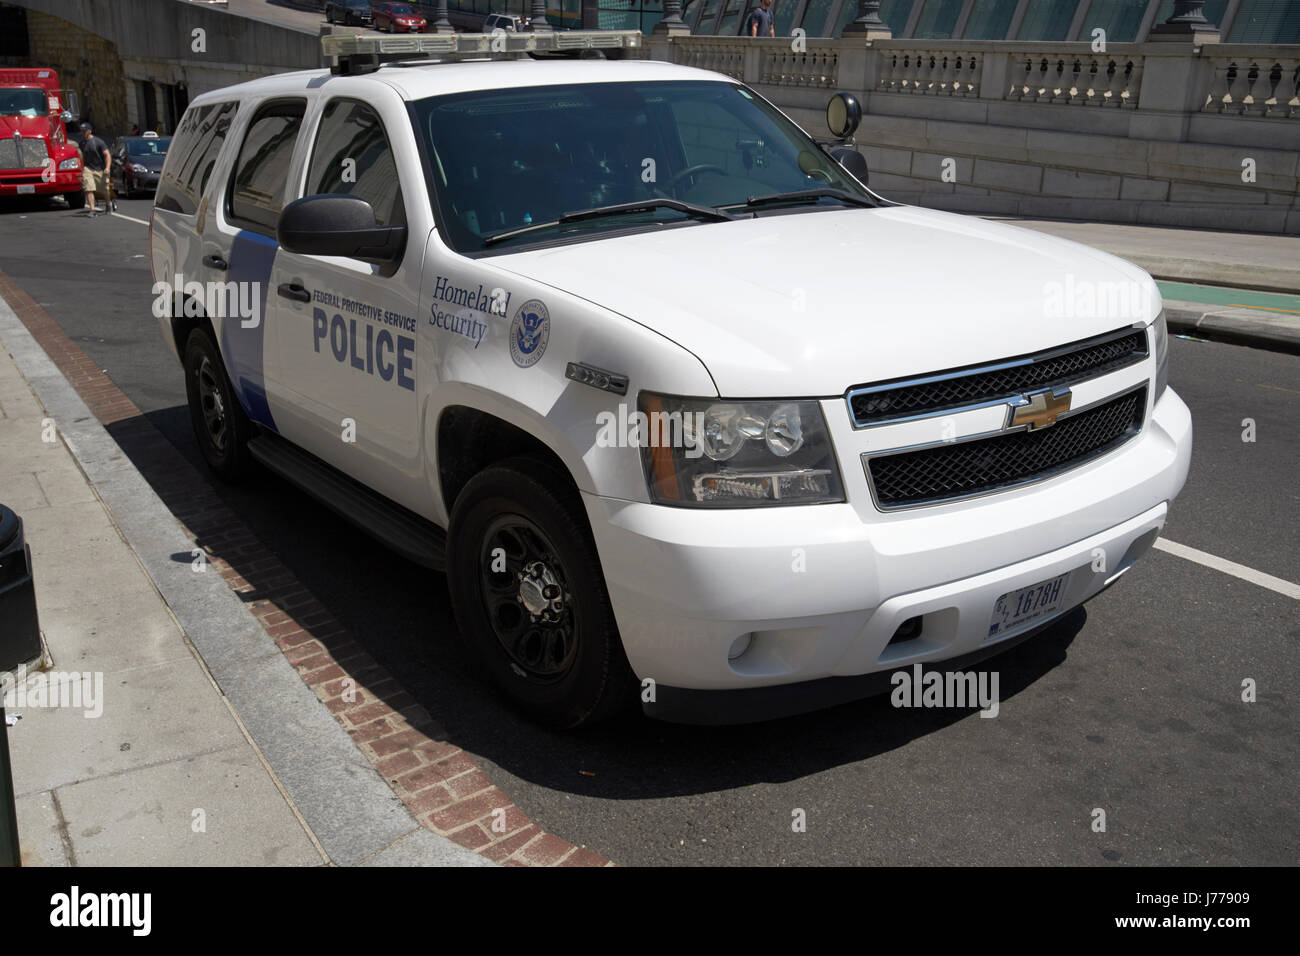 homeland security federal protective service police suv Washington DC USA - Stock Image